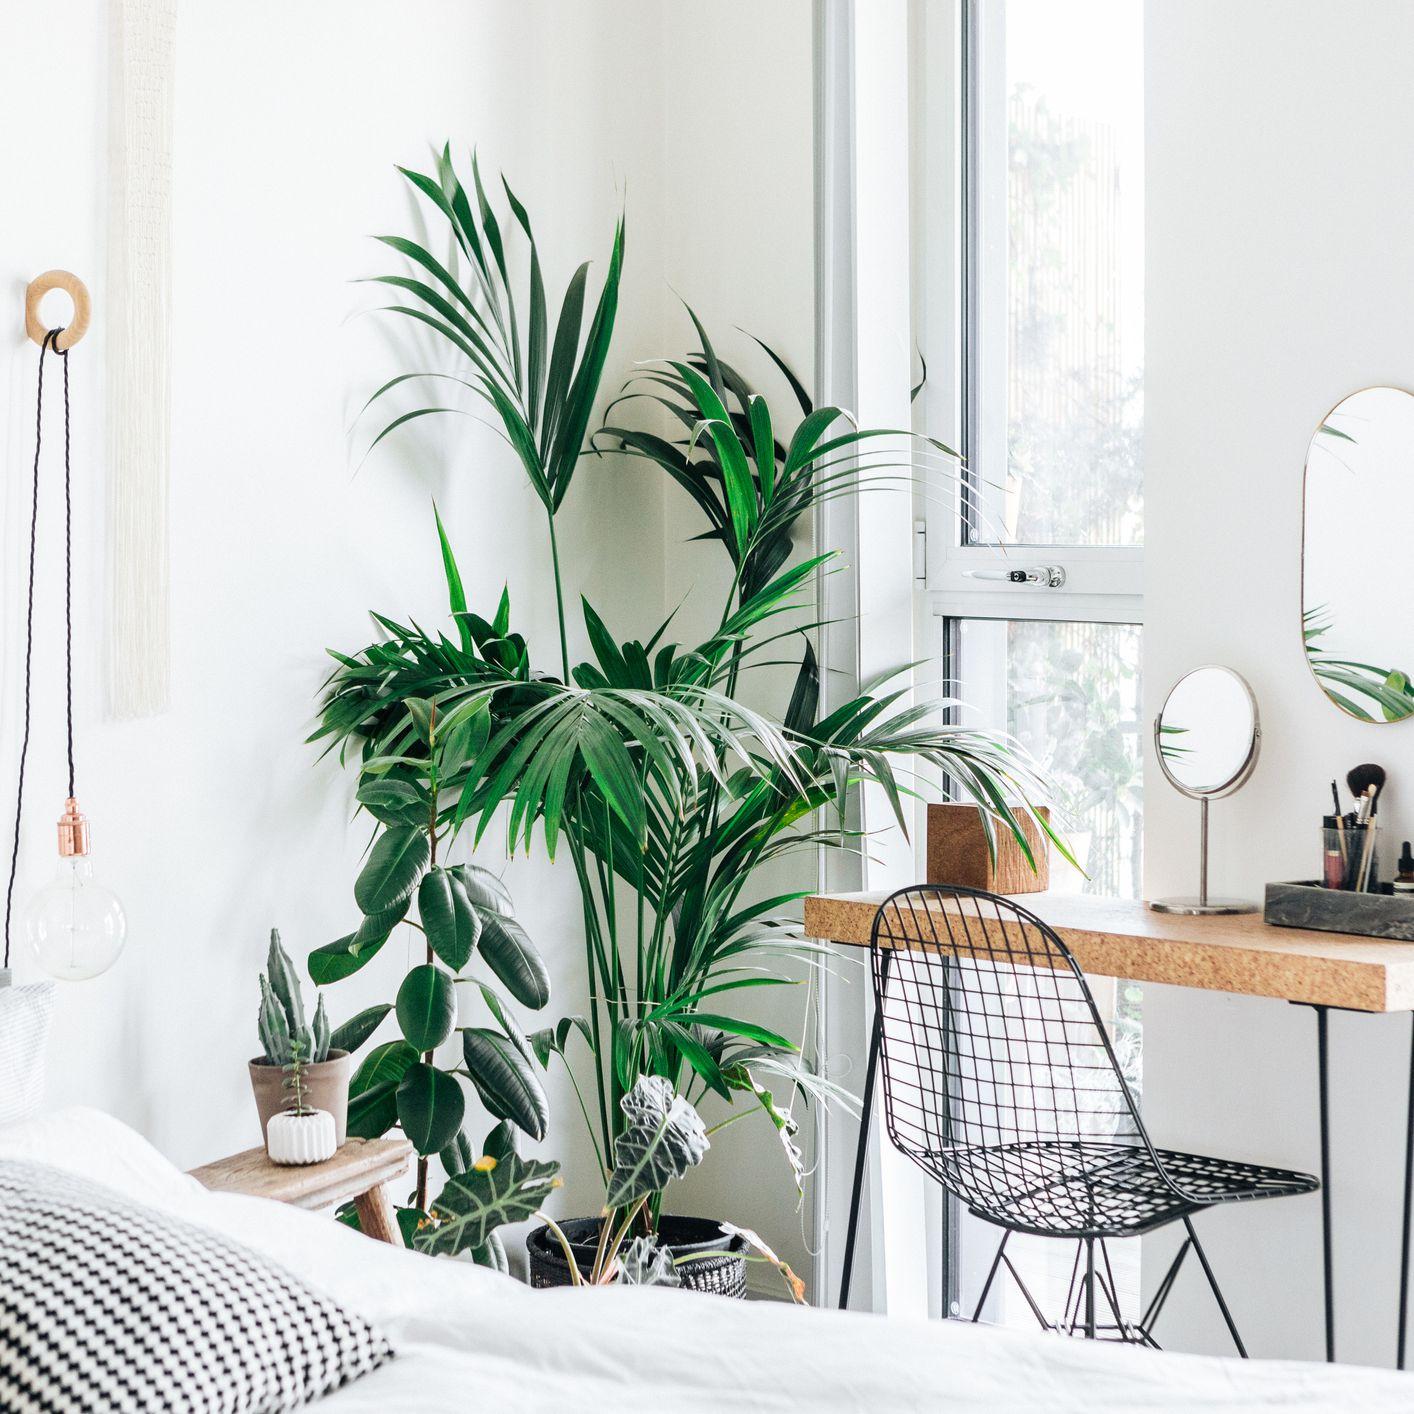 Top 10 Interior Design Instagram Accounts